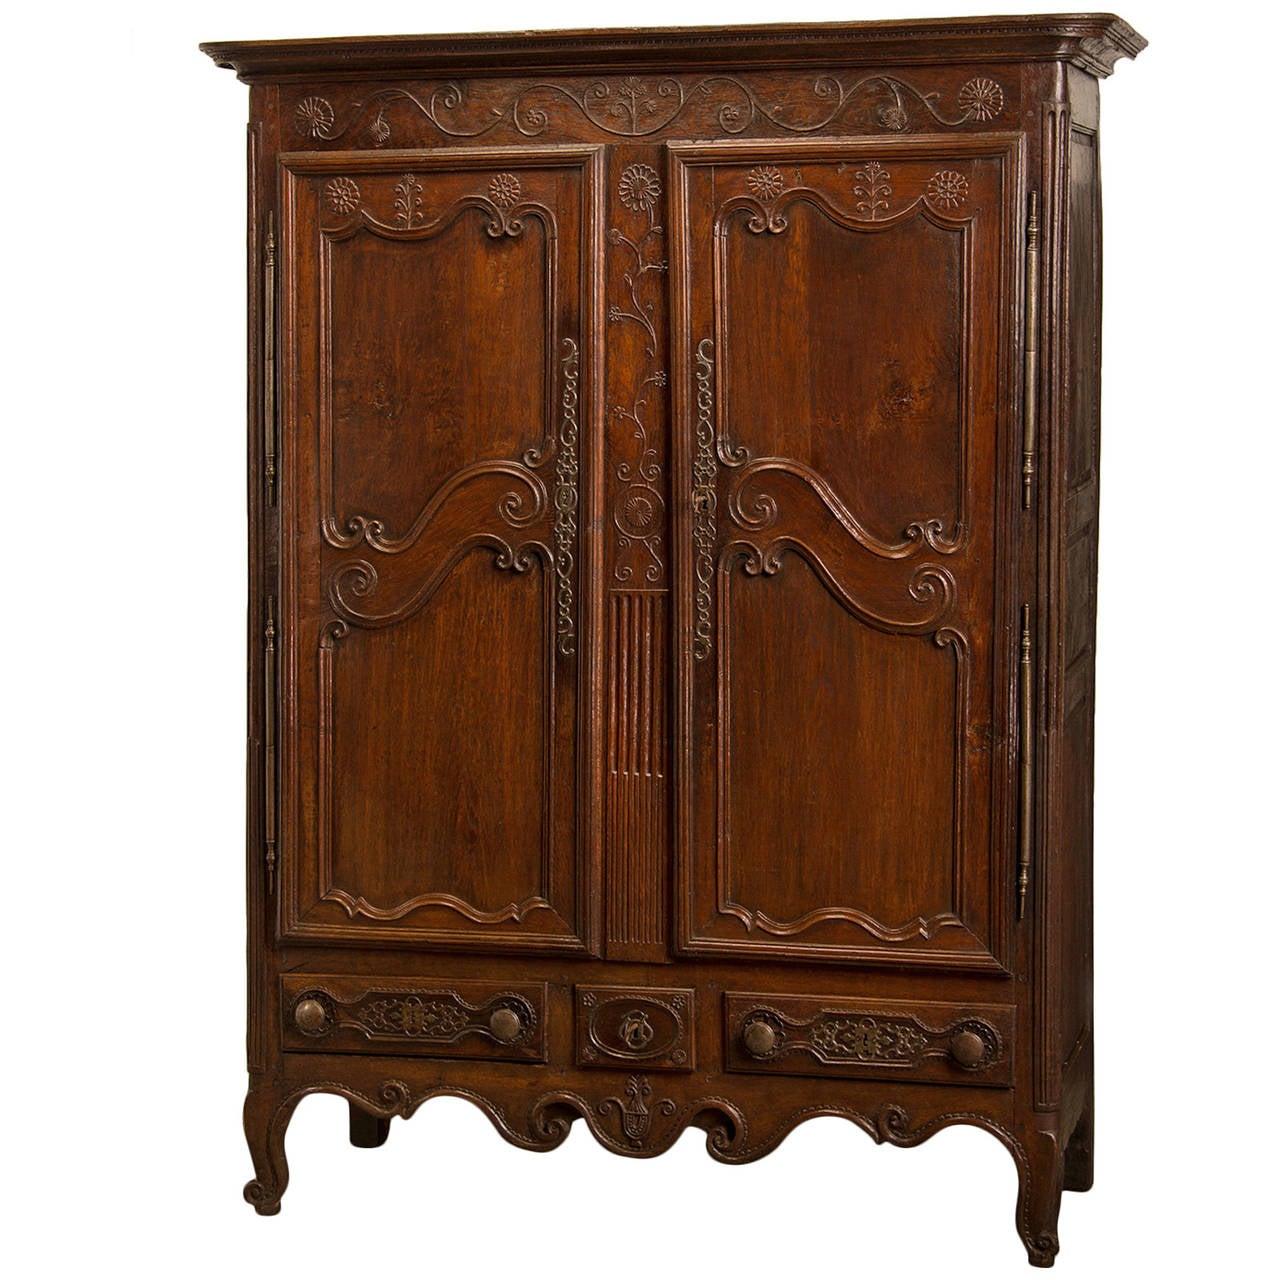 louis xvi period oak armoire original hardware france. Black Bedroom Furniture Sets. Home Design Ideas